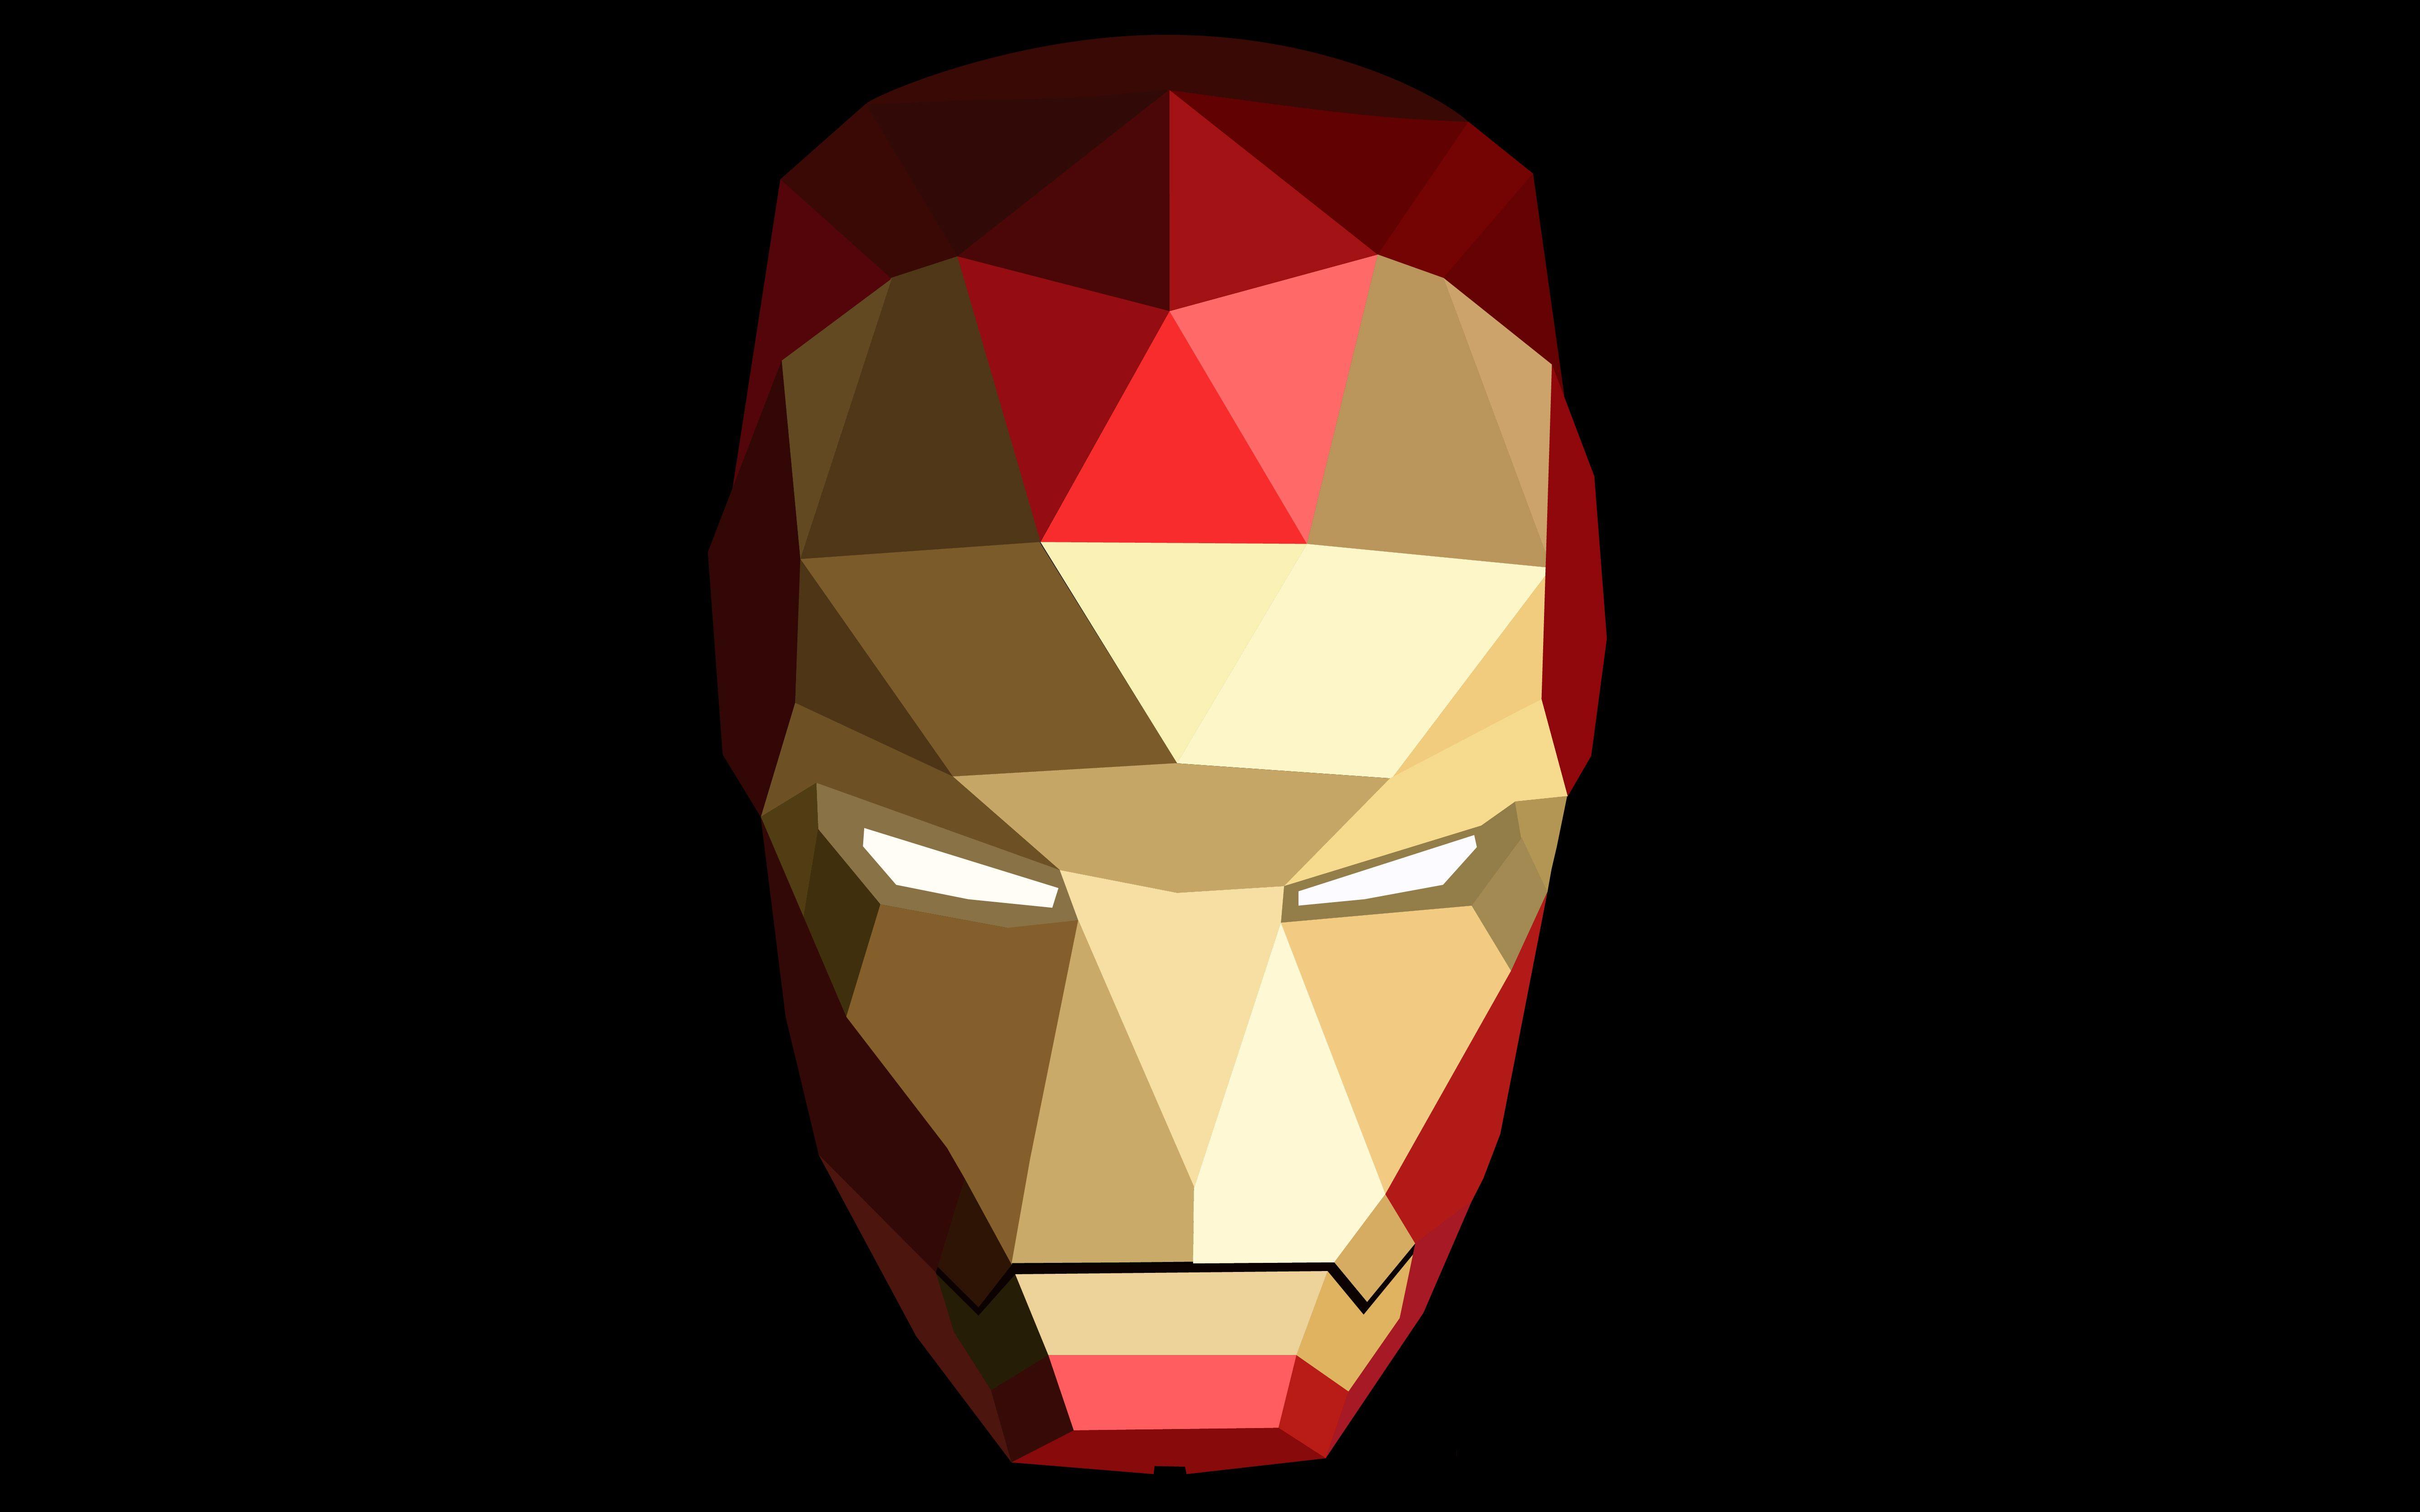 Geometric Iron Man, HD Superheroes, 4k Wallpapers, Images ...